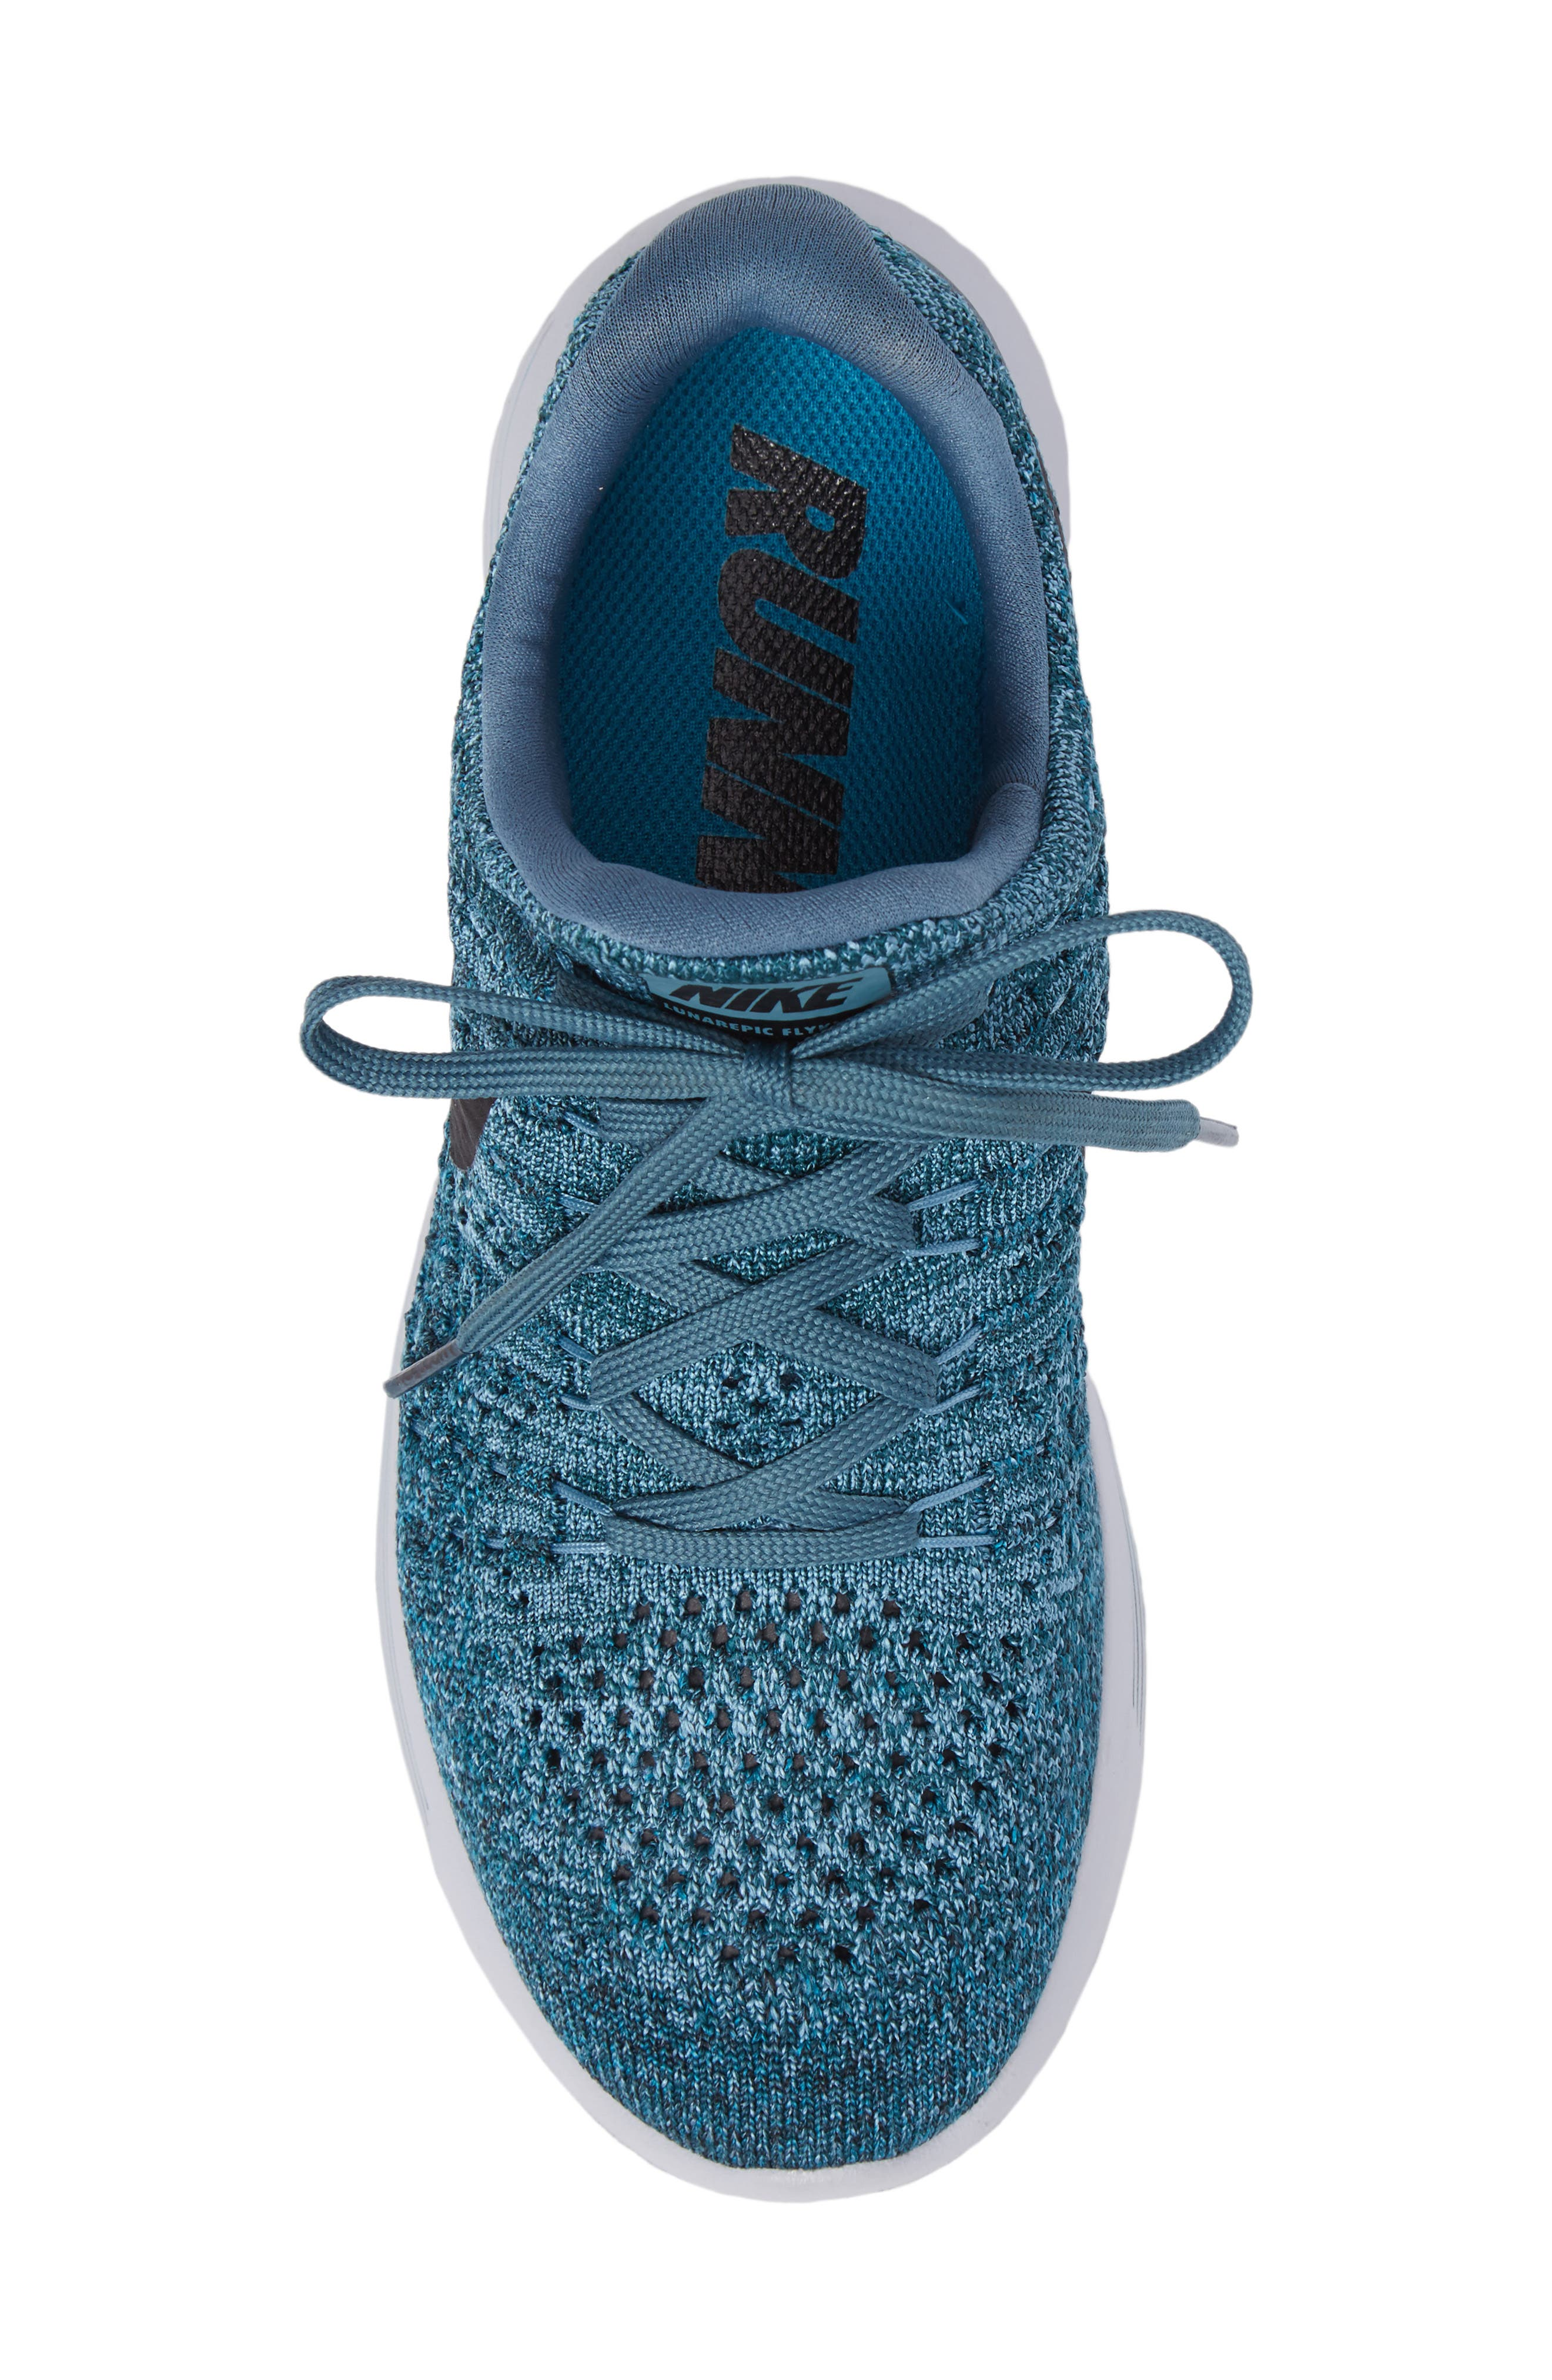 LunarEpic Low Flyknit 2 Running Shoe,                             Alternate thumbnail 82, color,